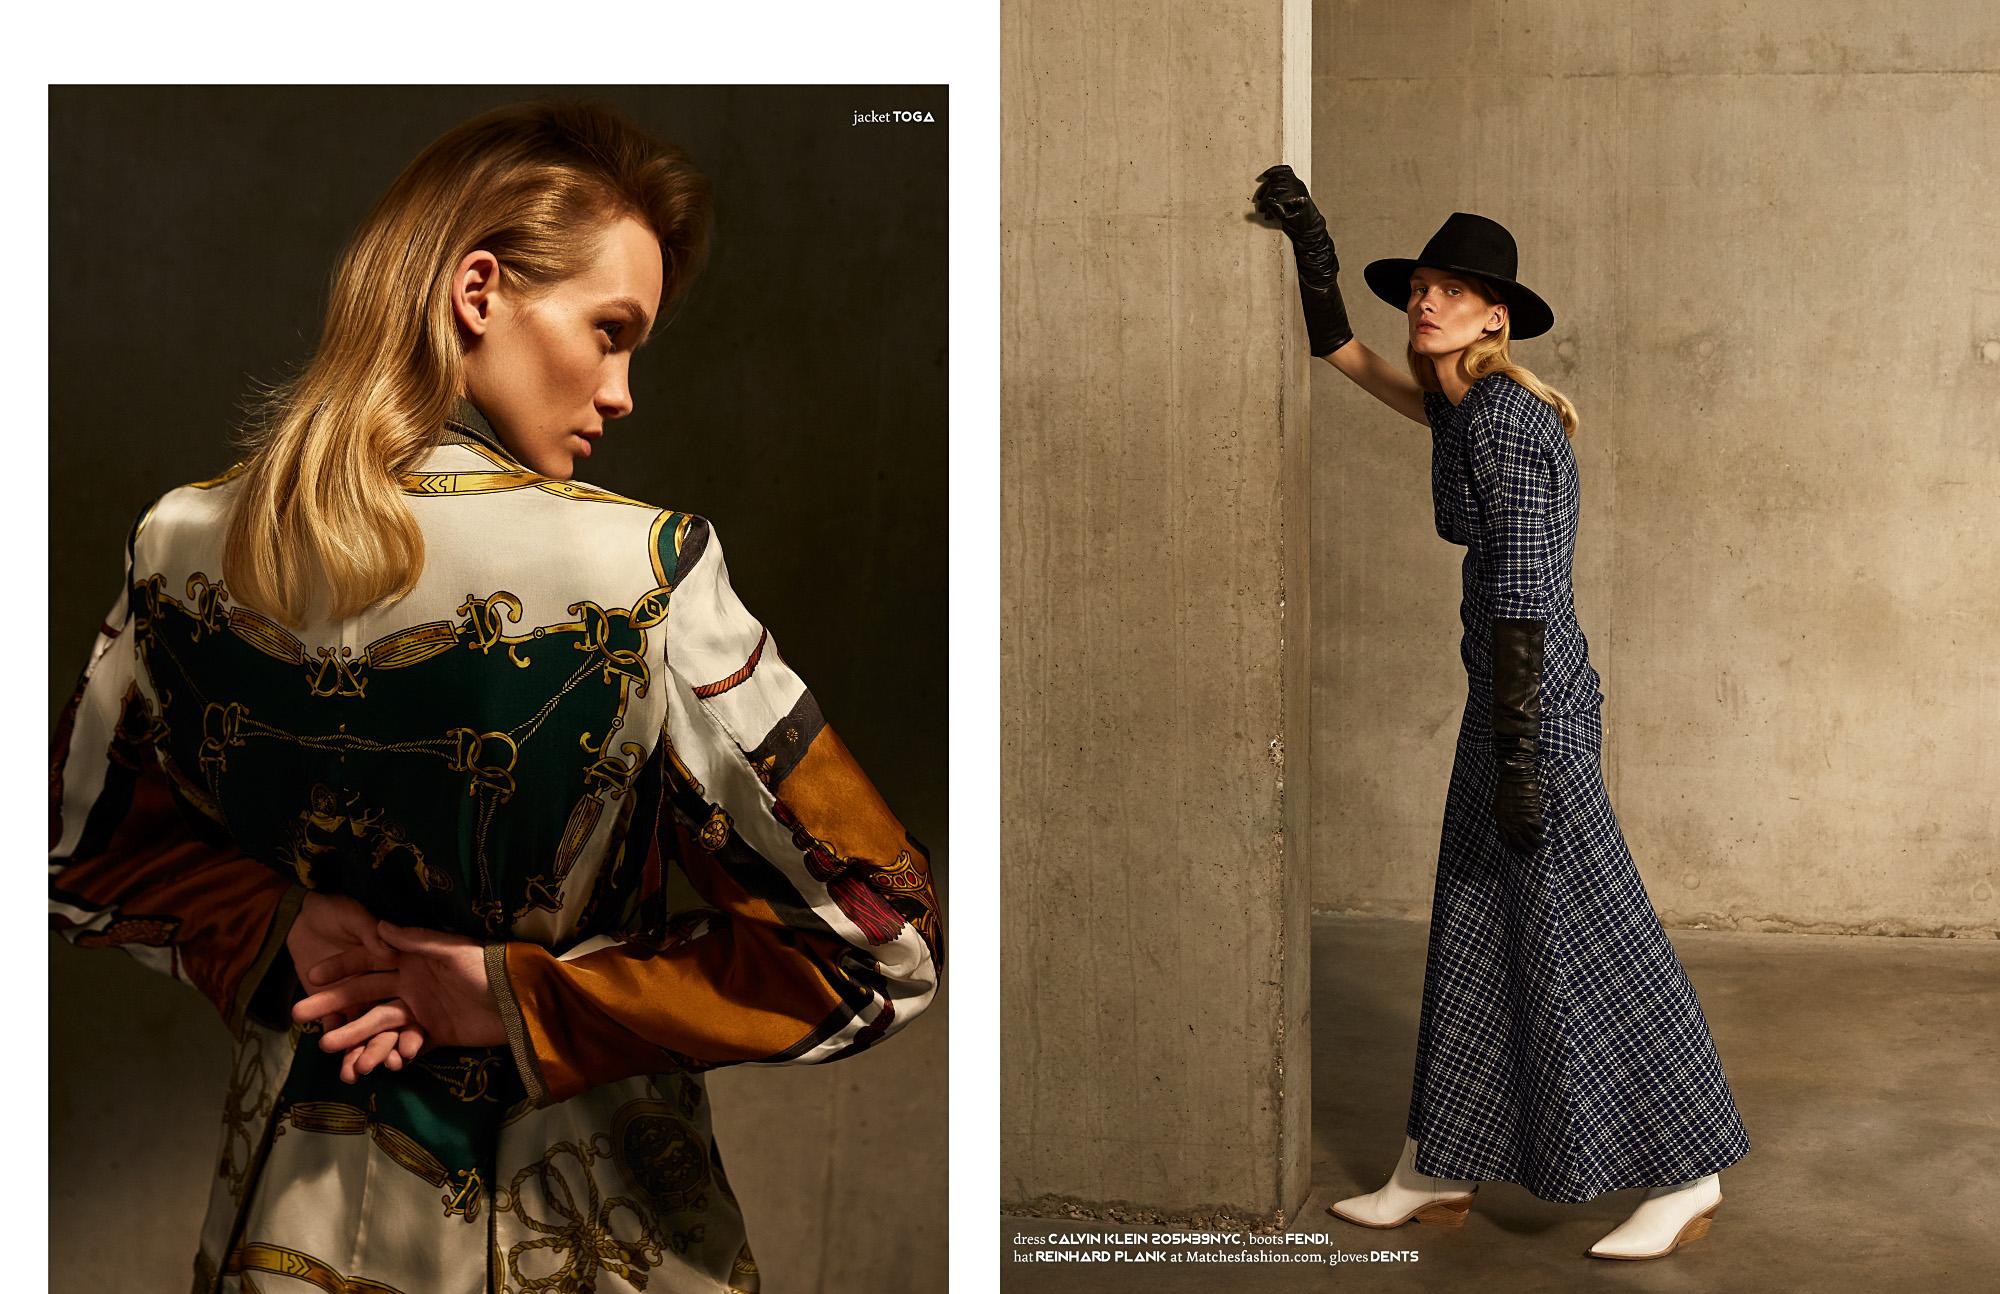 PIBE Magazine Fashion toga calvin klein fendi reinhard plank dents.jpg